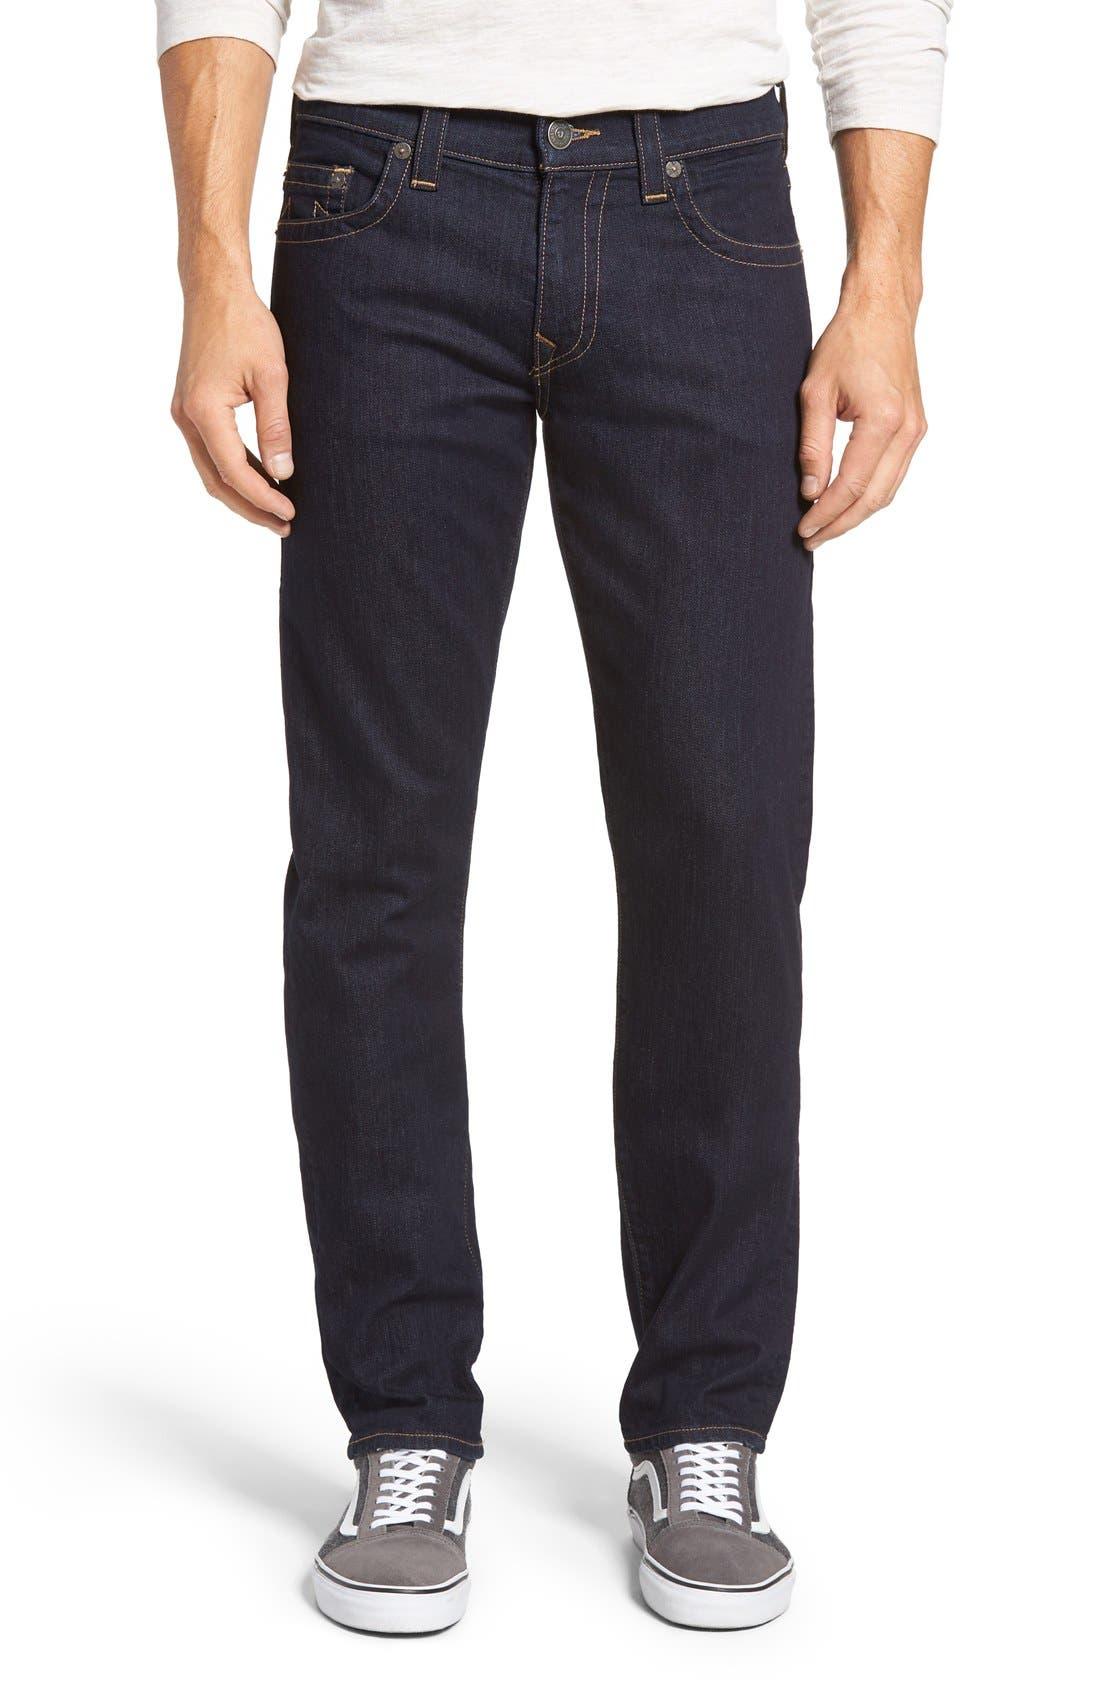 Geno Straight Leg Jeans,                             Main thumbnail 1, color,                             403